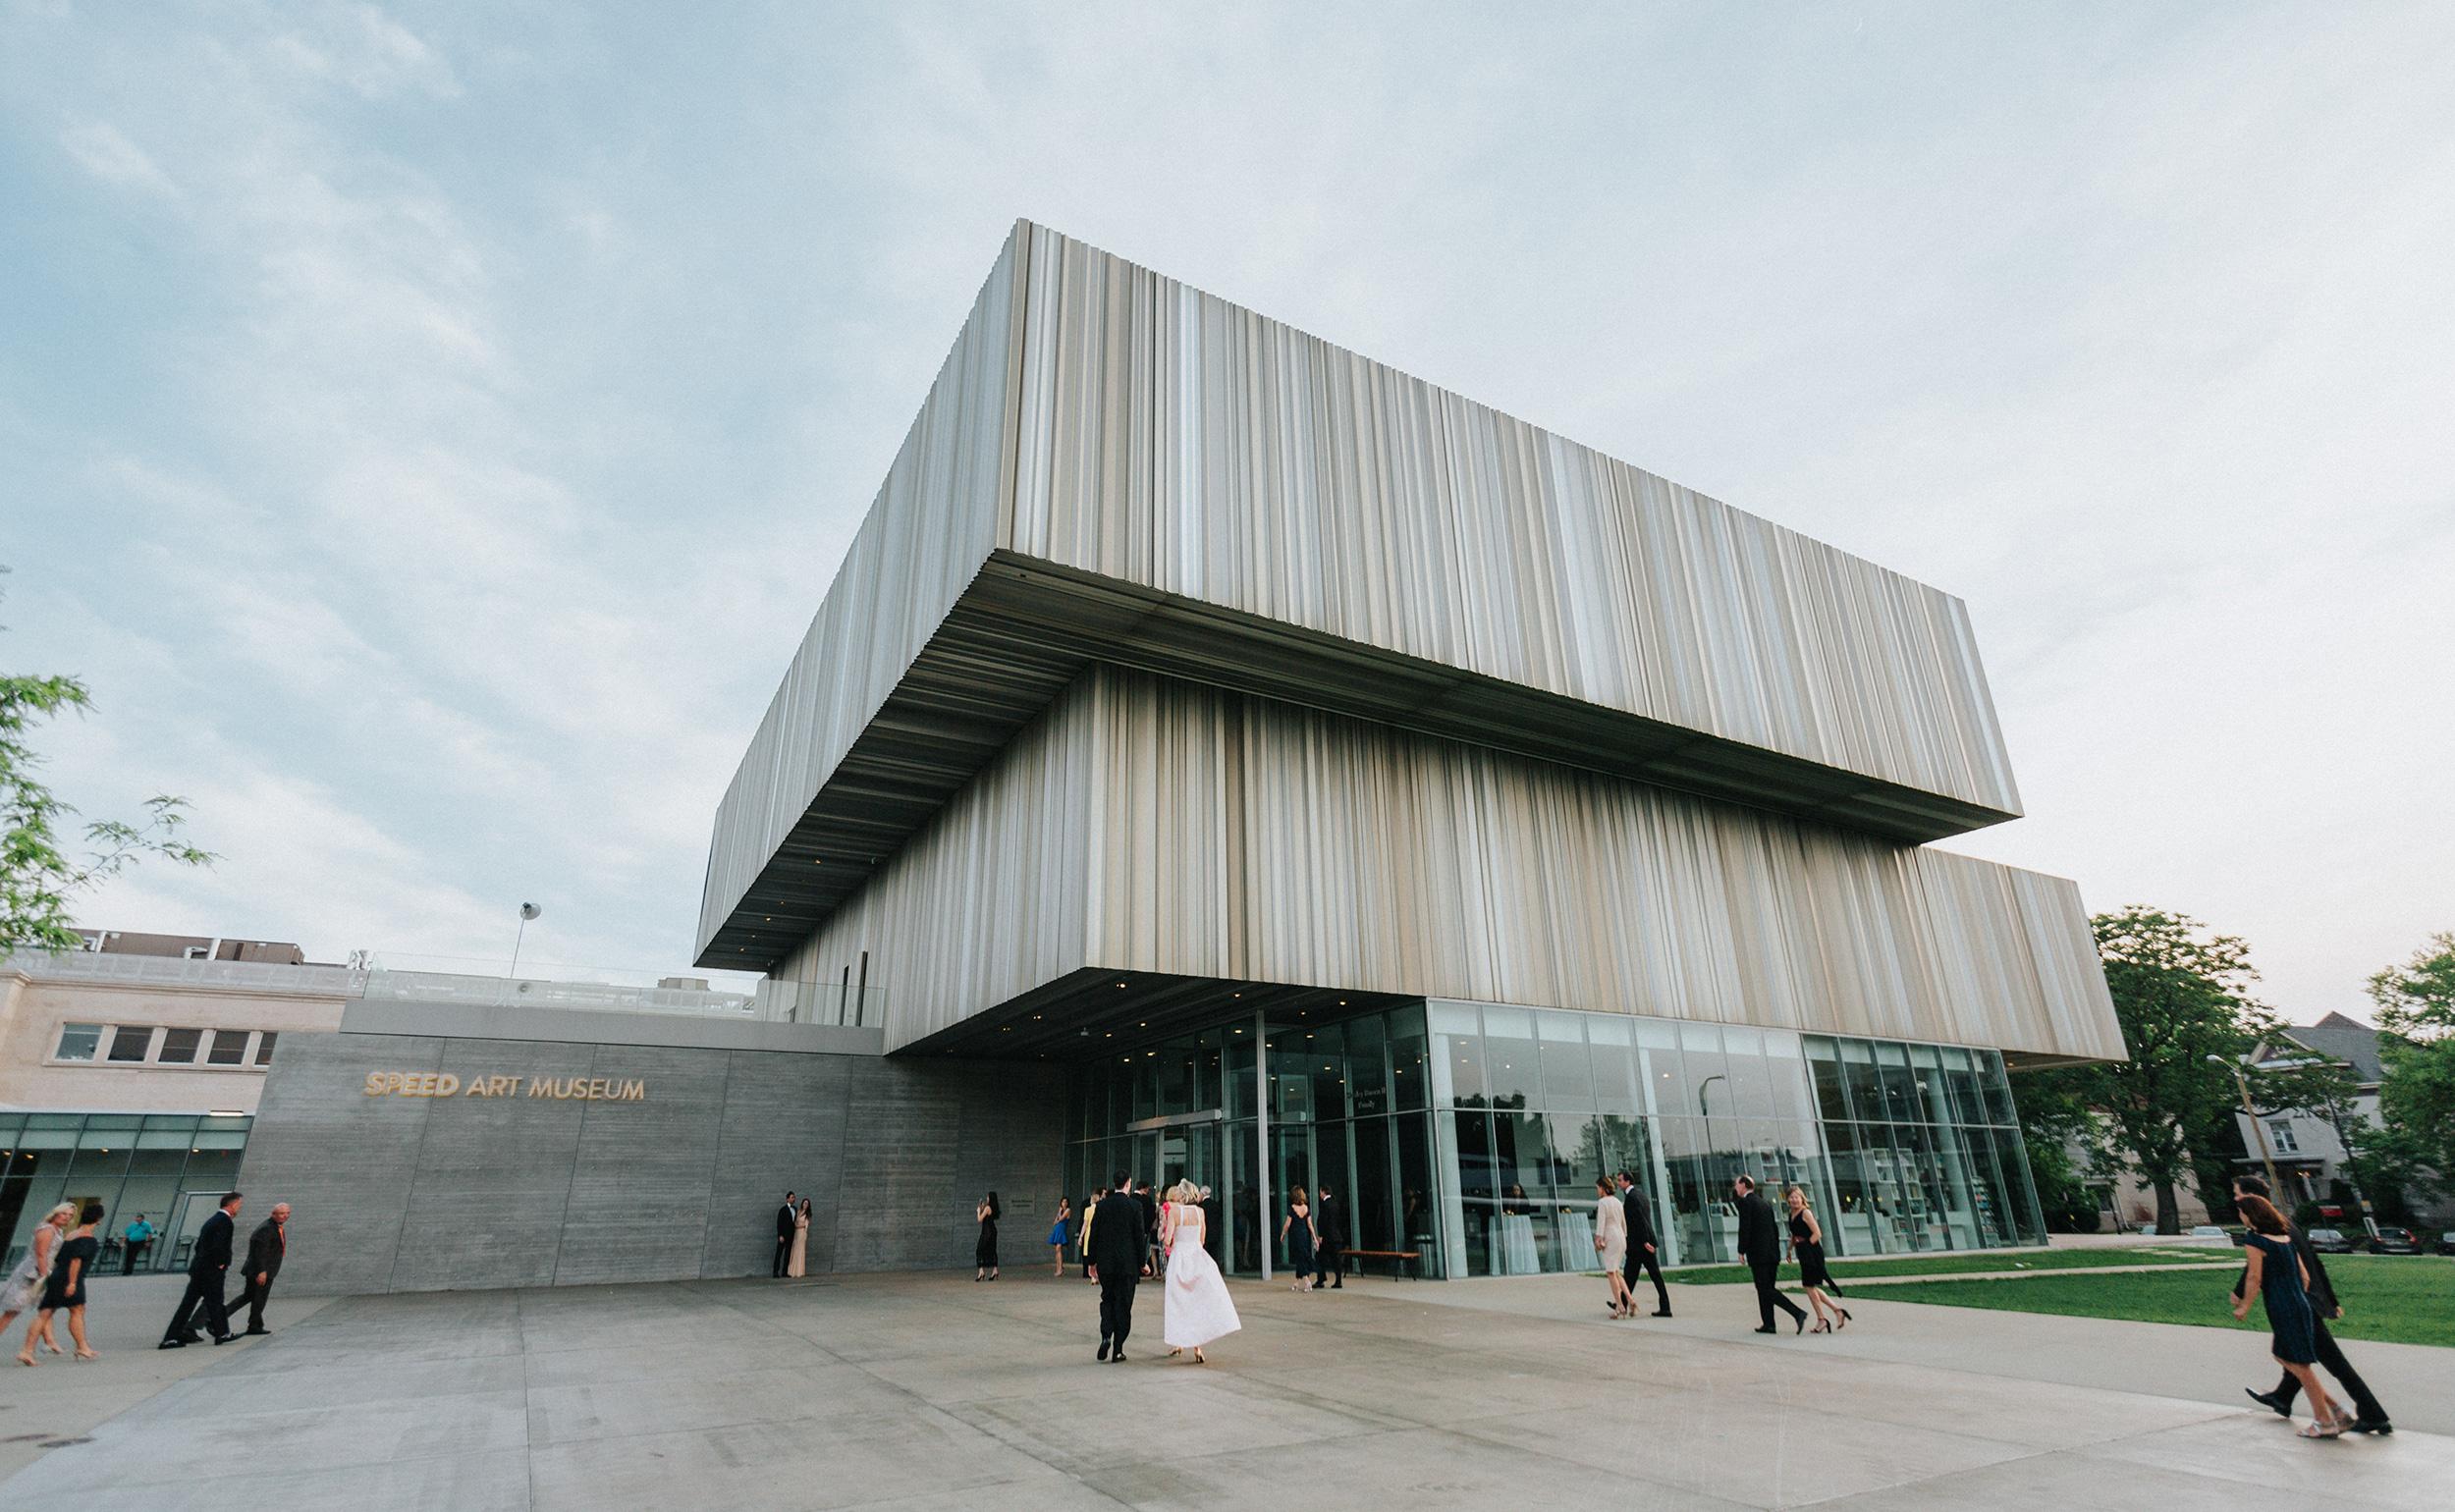 speed-art-museum-wedding-photographer-20.JPG